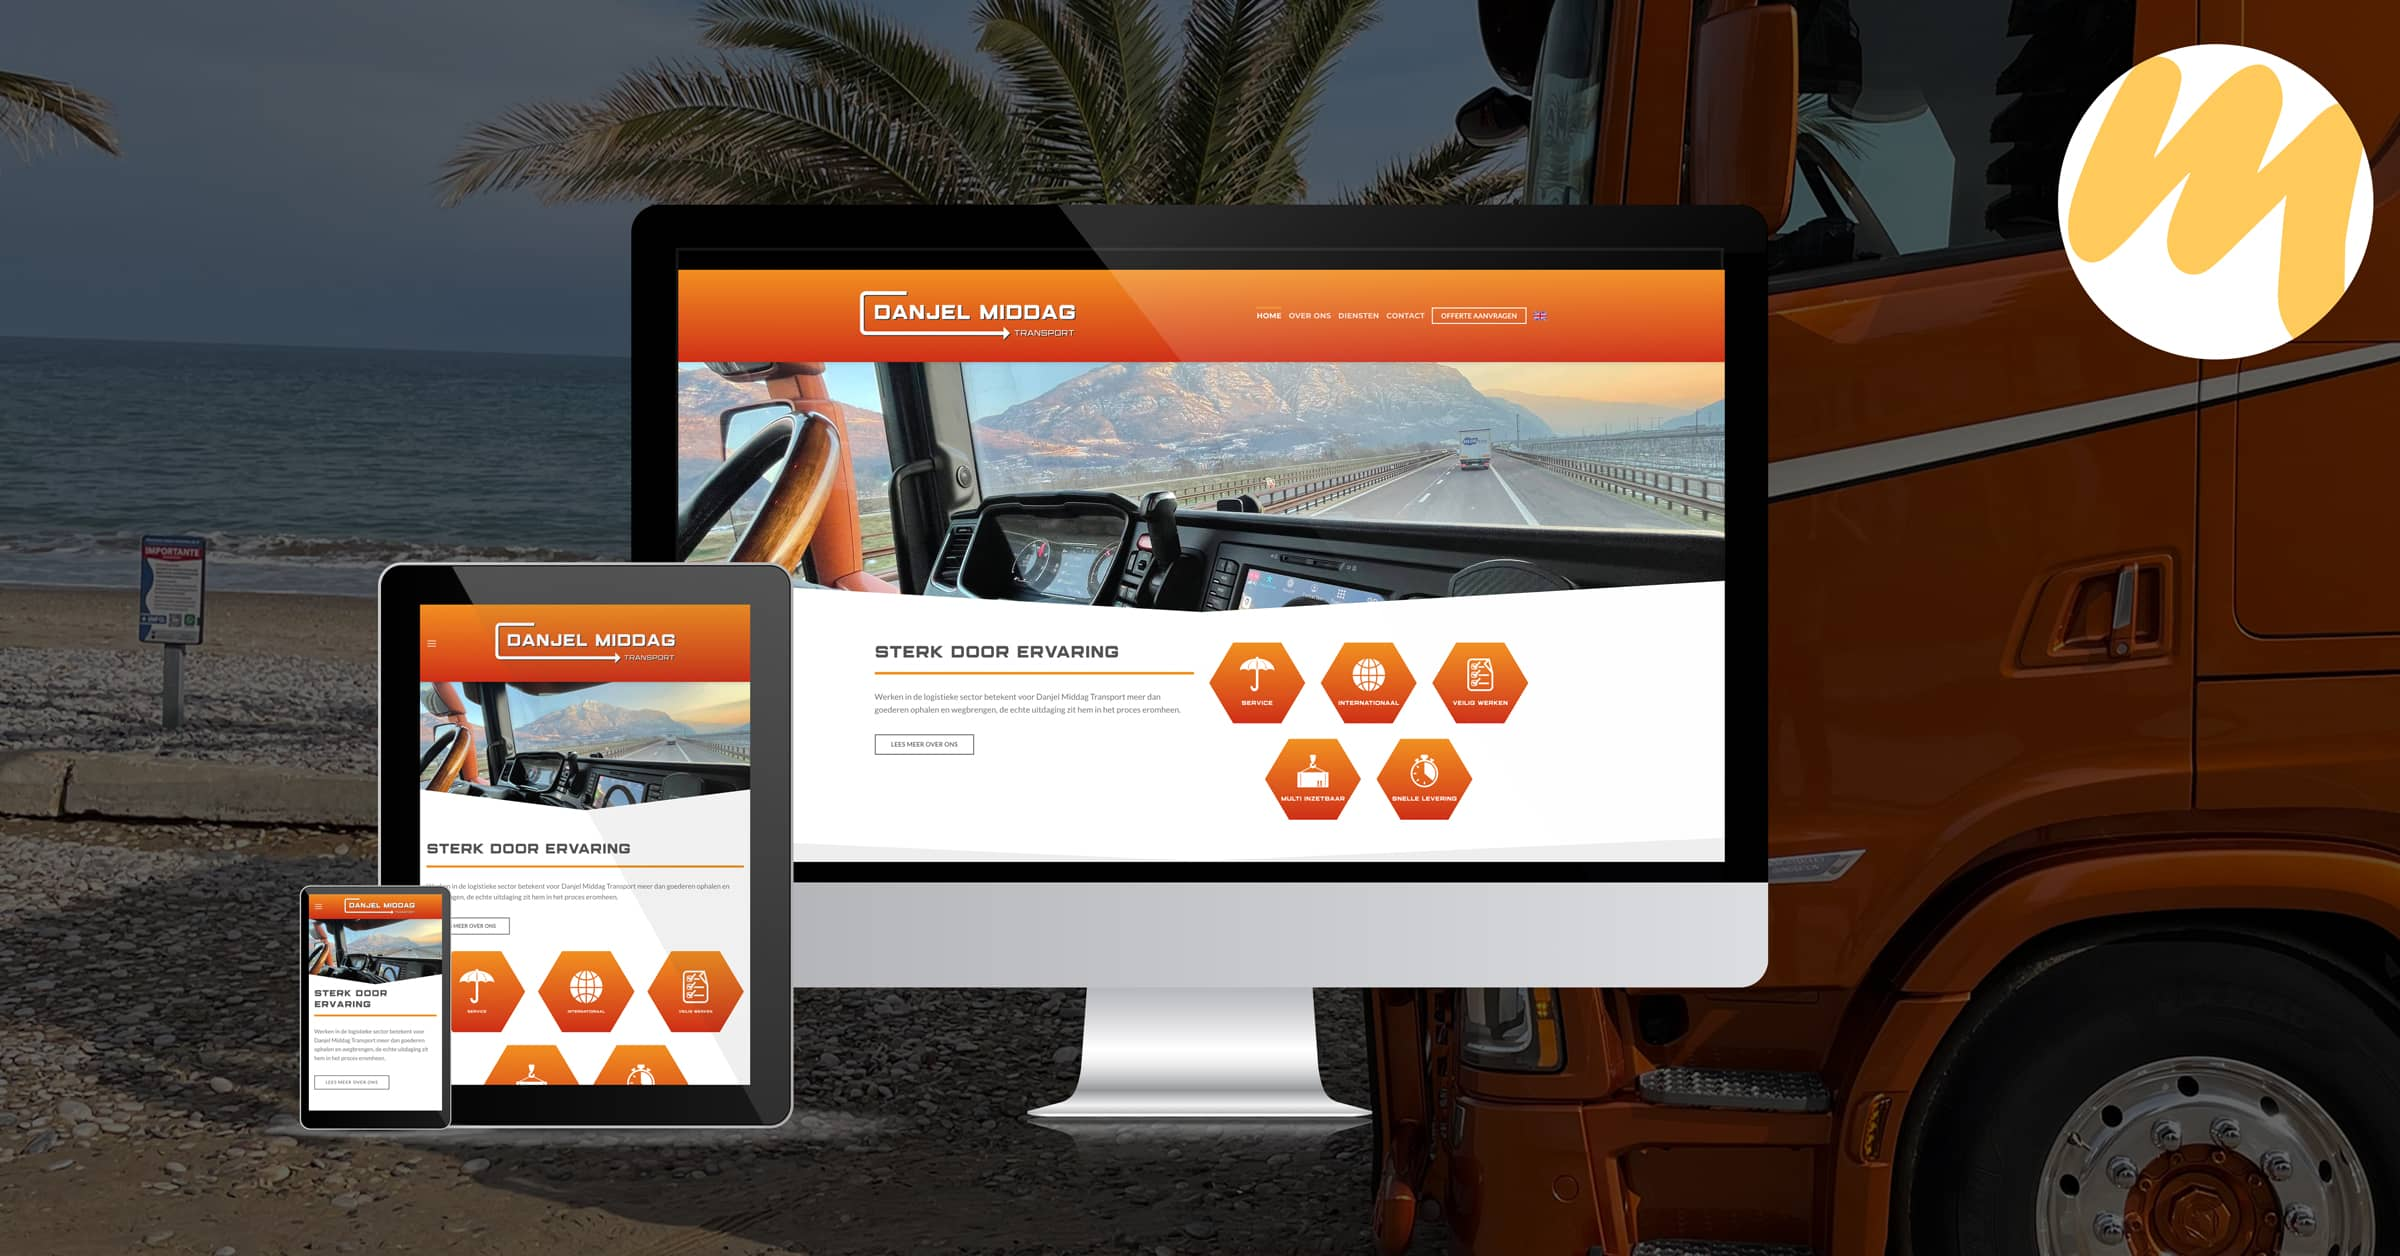 Webdesign Tiel | Danjel Middag Transport Waddenoijen, logo ontwerp, grafisch design, Esmy Media Design Betuwe, Webdesign Gelderland